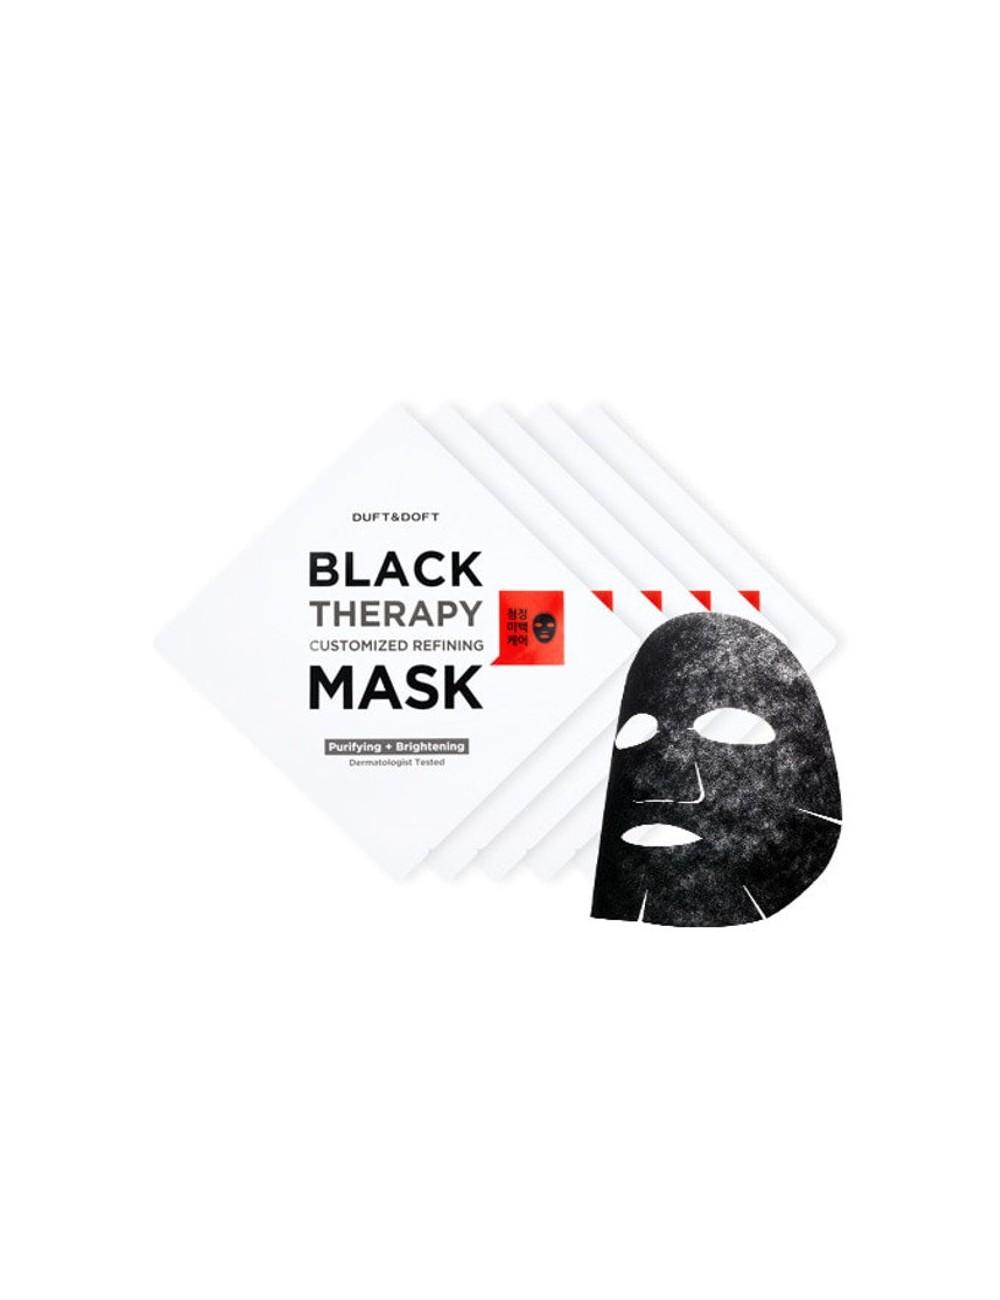 Mascarilla Purificante e Iluminadora Duft & Doft Black Therapy Custimized Refining Mask